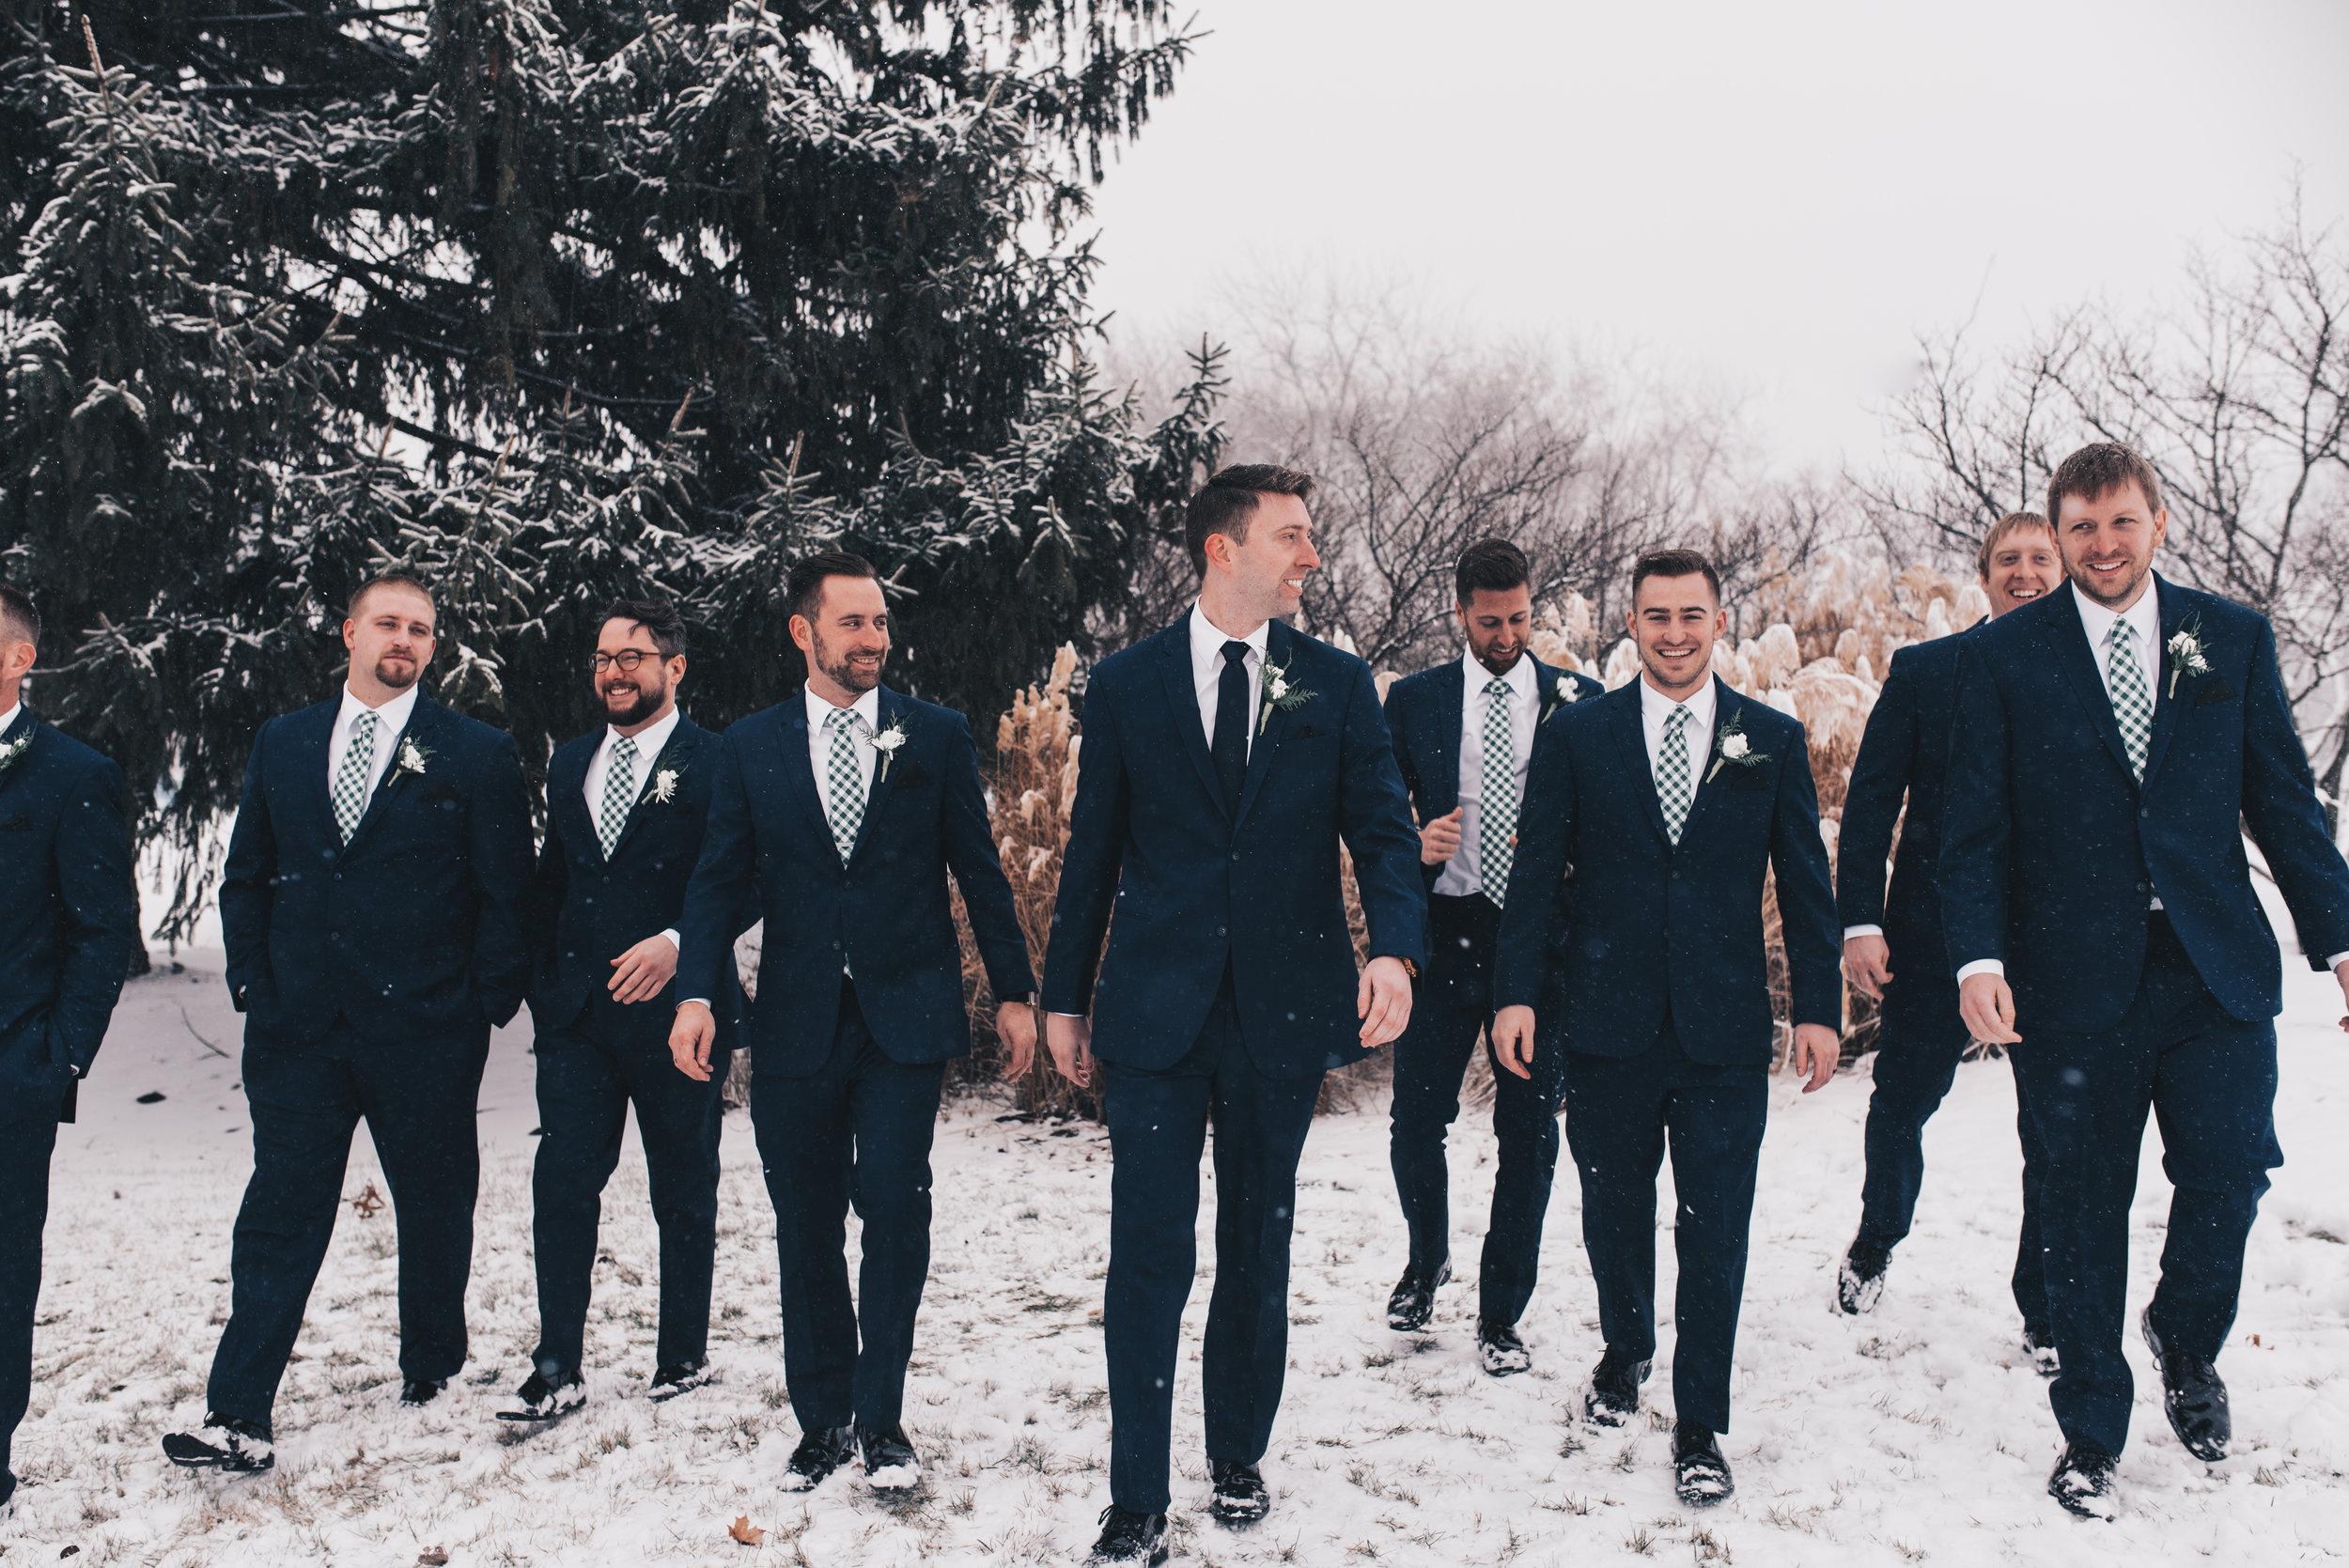 Winter Wedding, Chicago Winter Wedding, Chicago Wedding Photographer, Illinois Wedding, Illinois Wedding Photographer, Classy Modern Wedding, Groomsmen Photos, Bride And Groom Photos